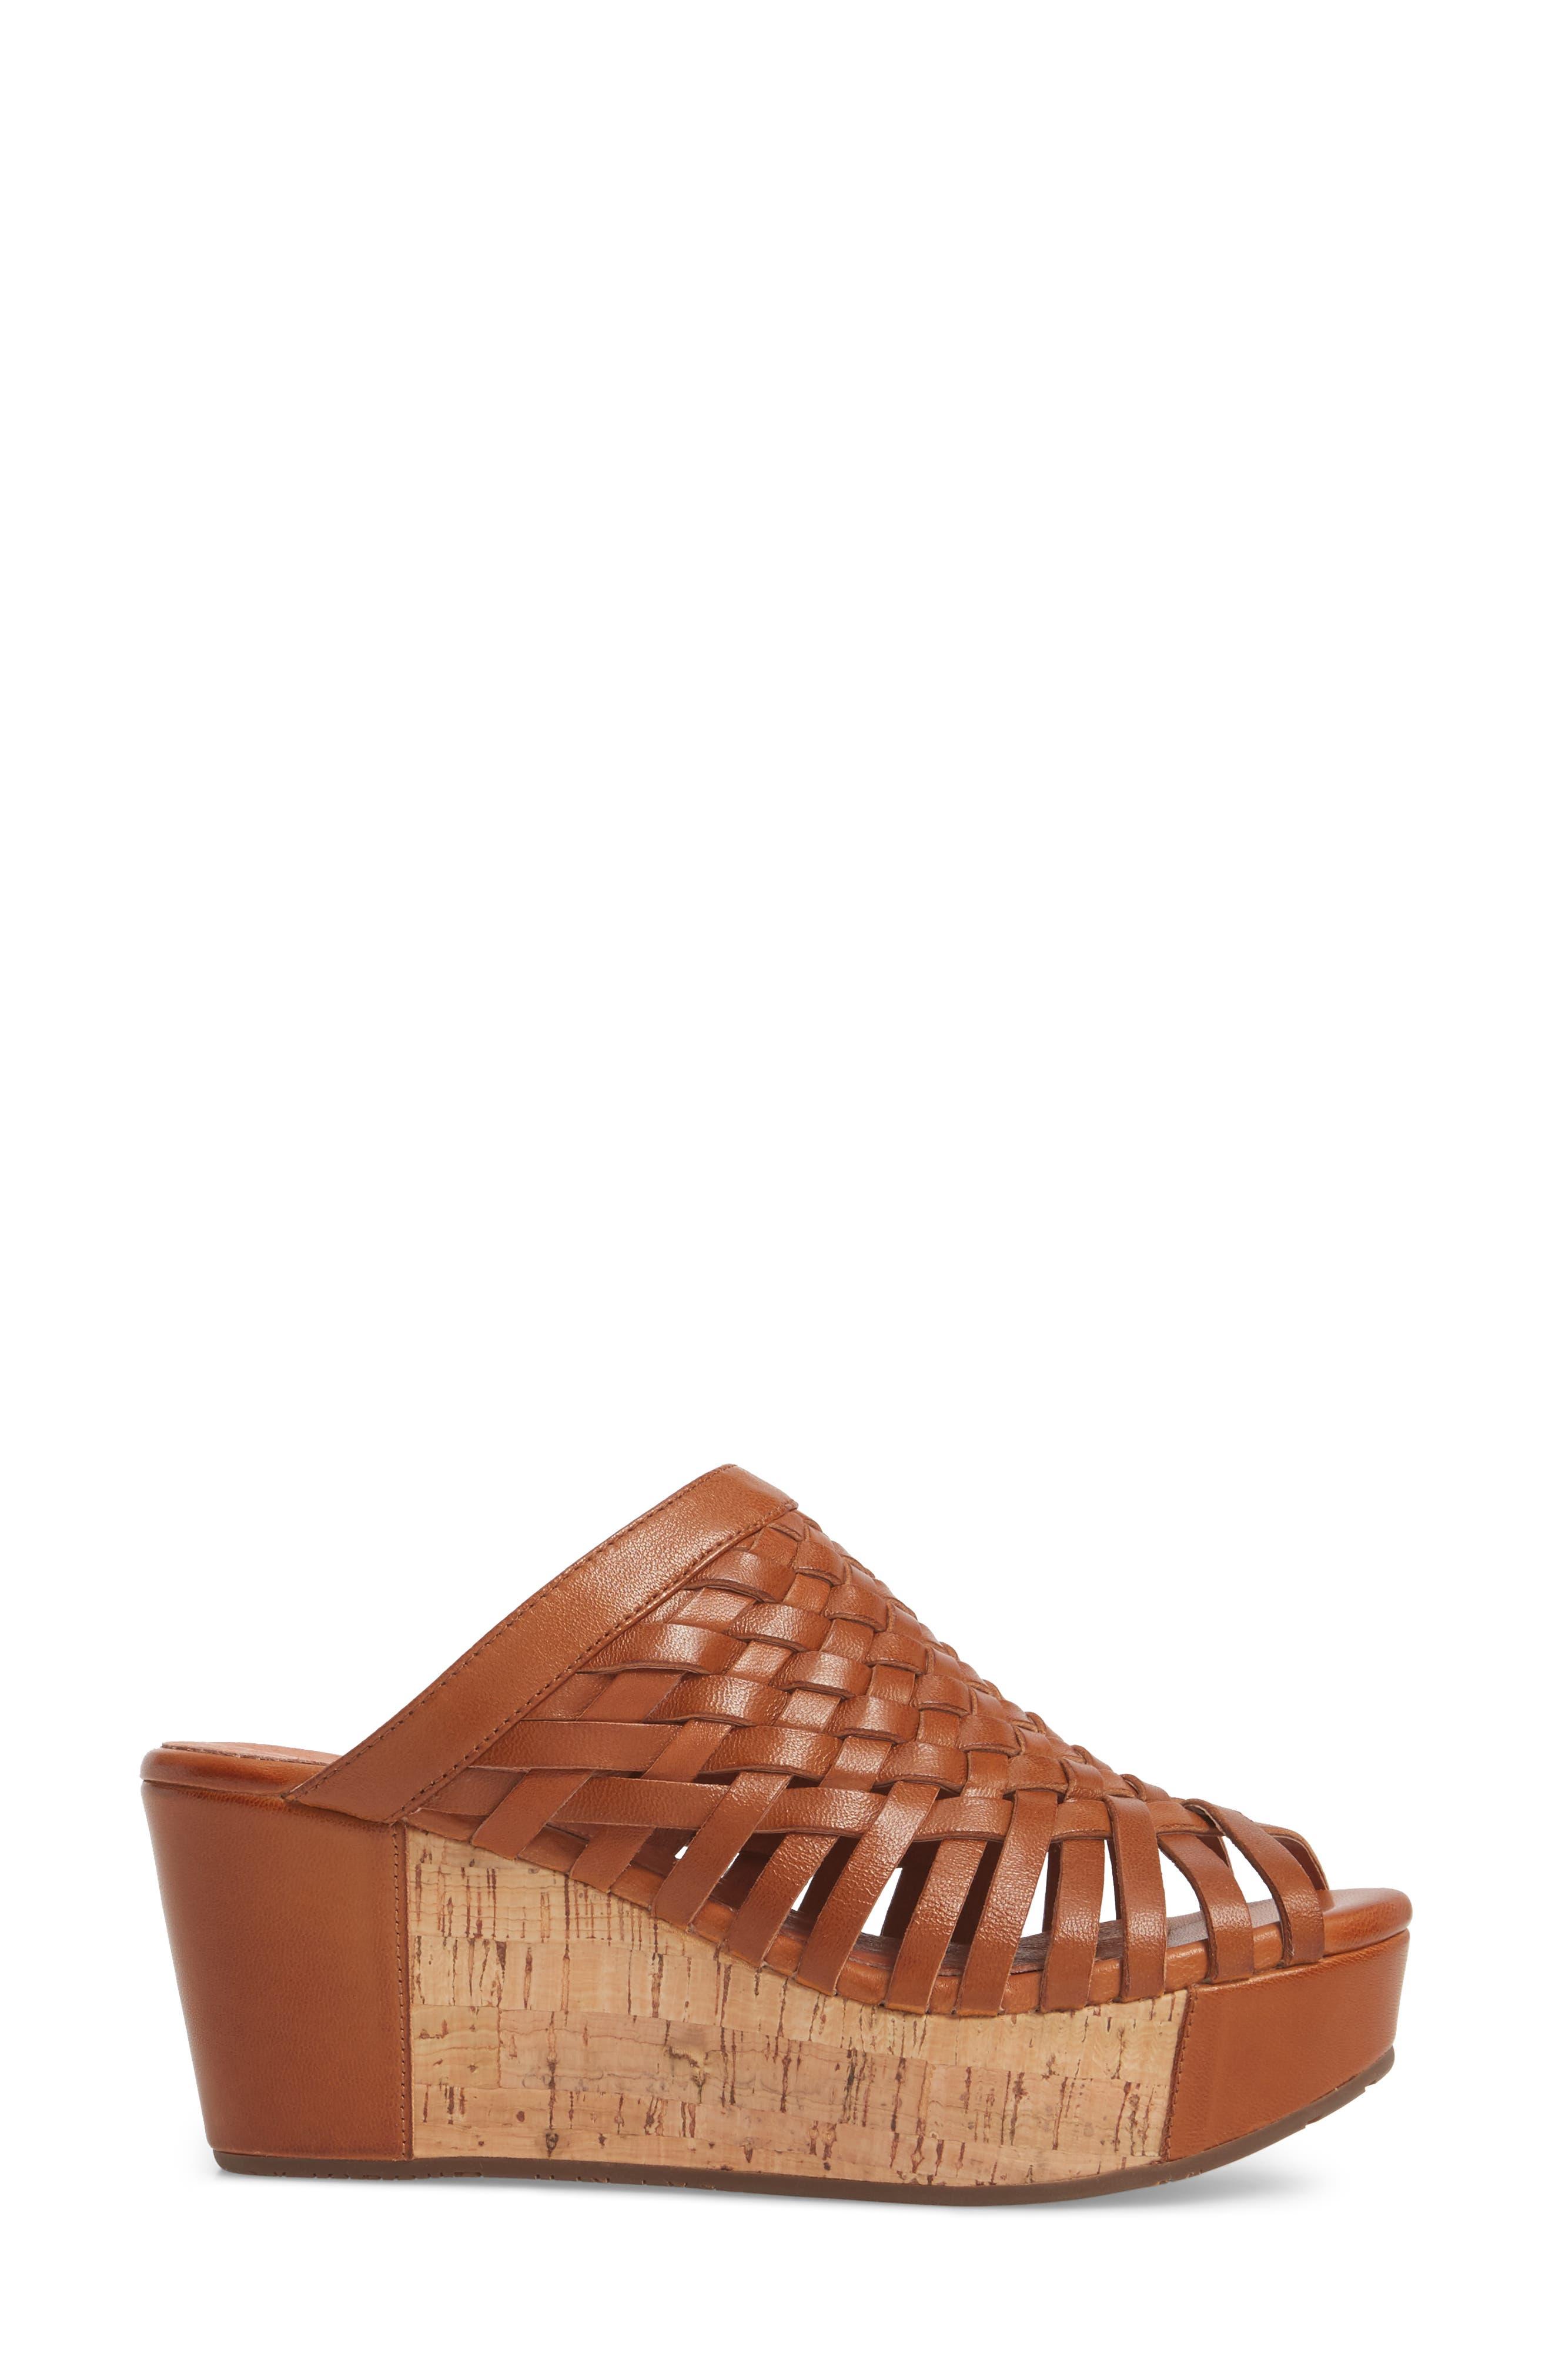 Walda Platform Wedge Sandal,                             Alternate thumbnail 8, color,